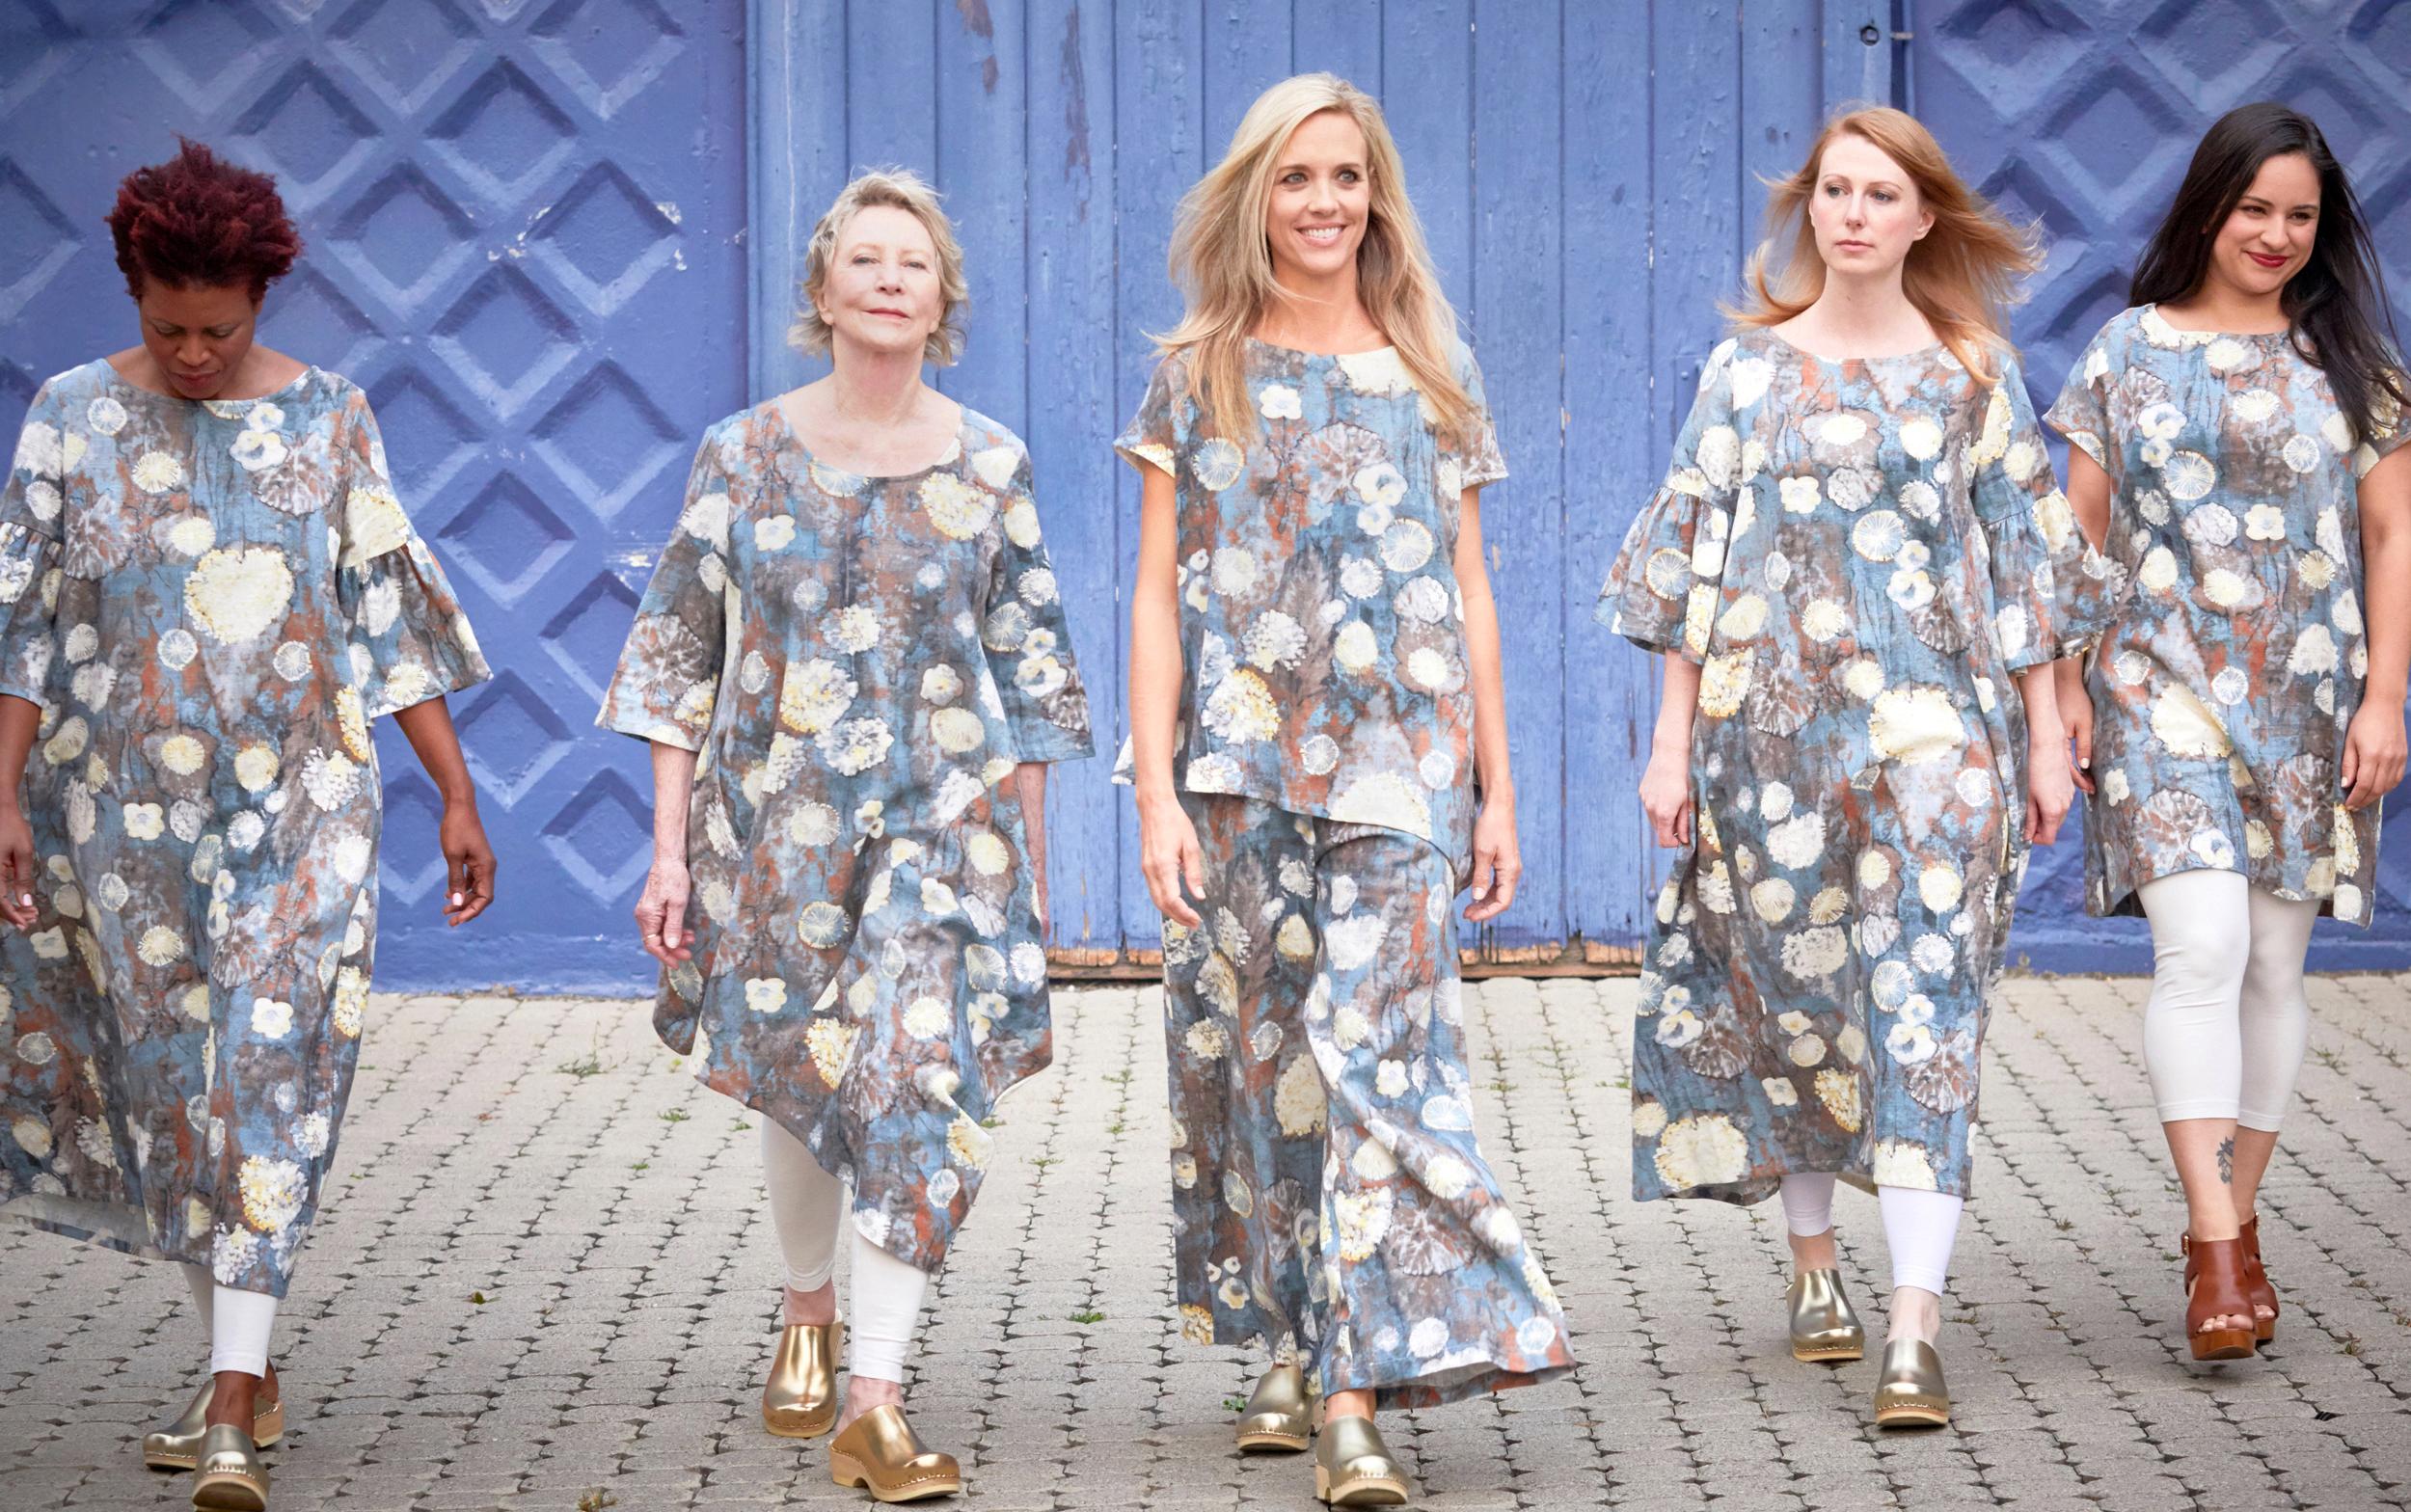 Kahlo Dress, Naida Tunic, Ivy Shirt, Long Full Pant, Ansel Tunic in Burdock Cumbria Linen, Legging in Cream Bamboo Cotton